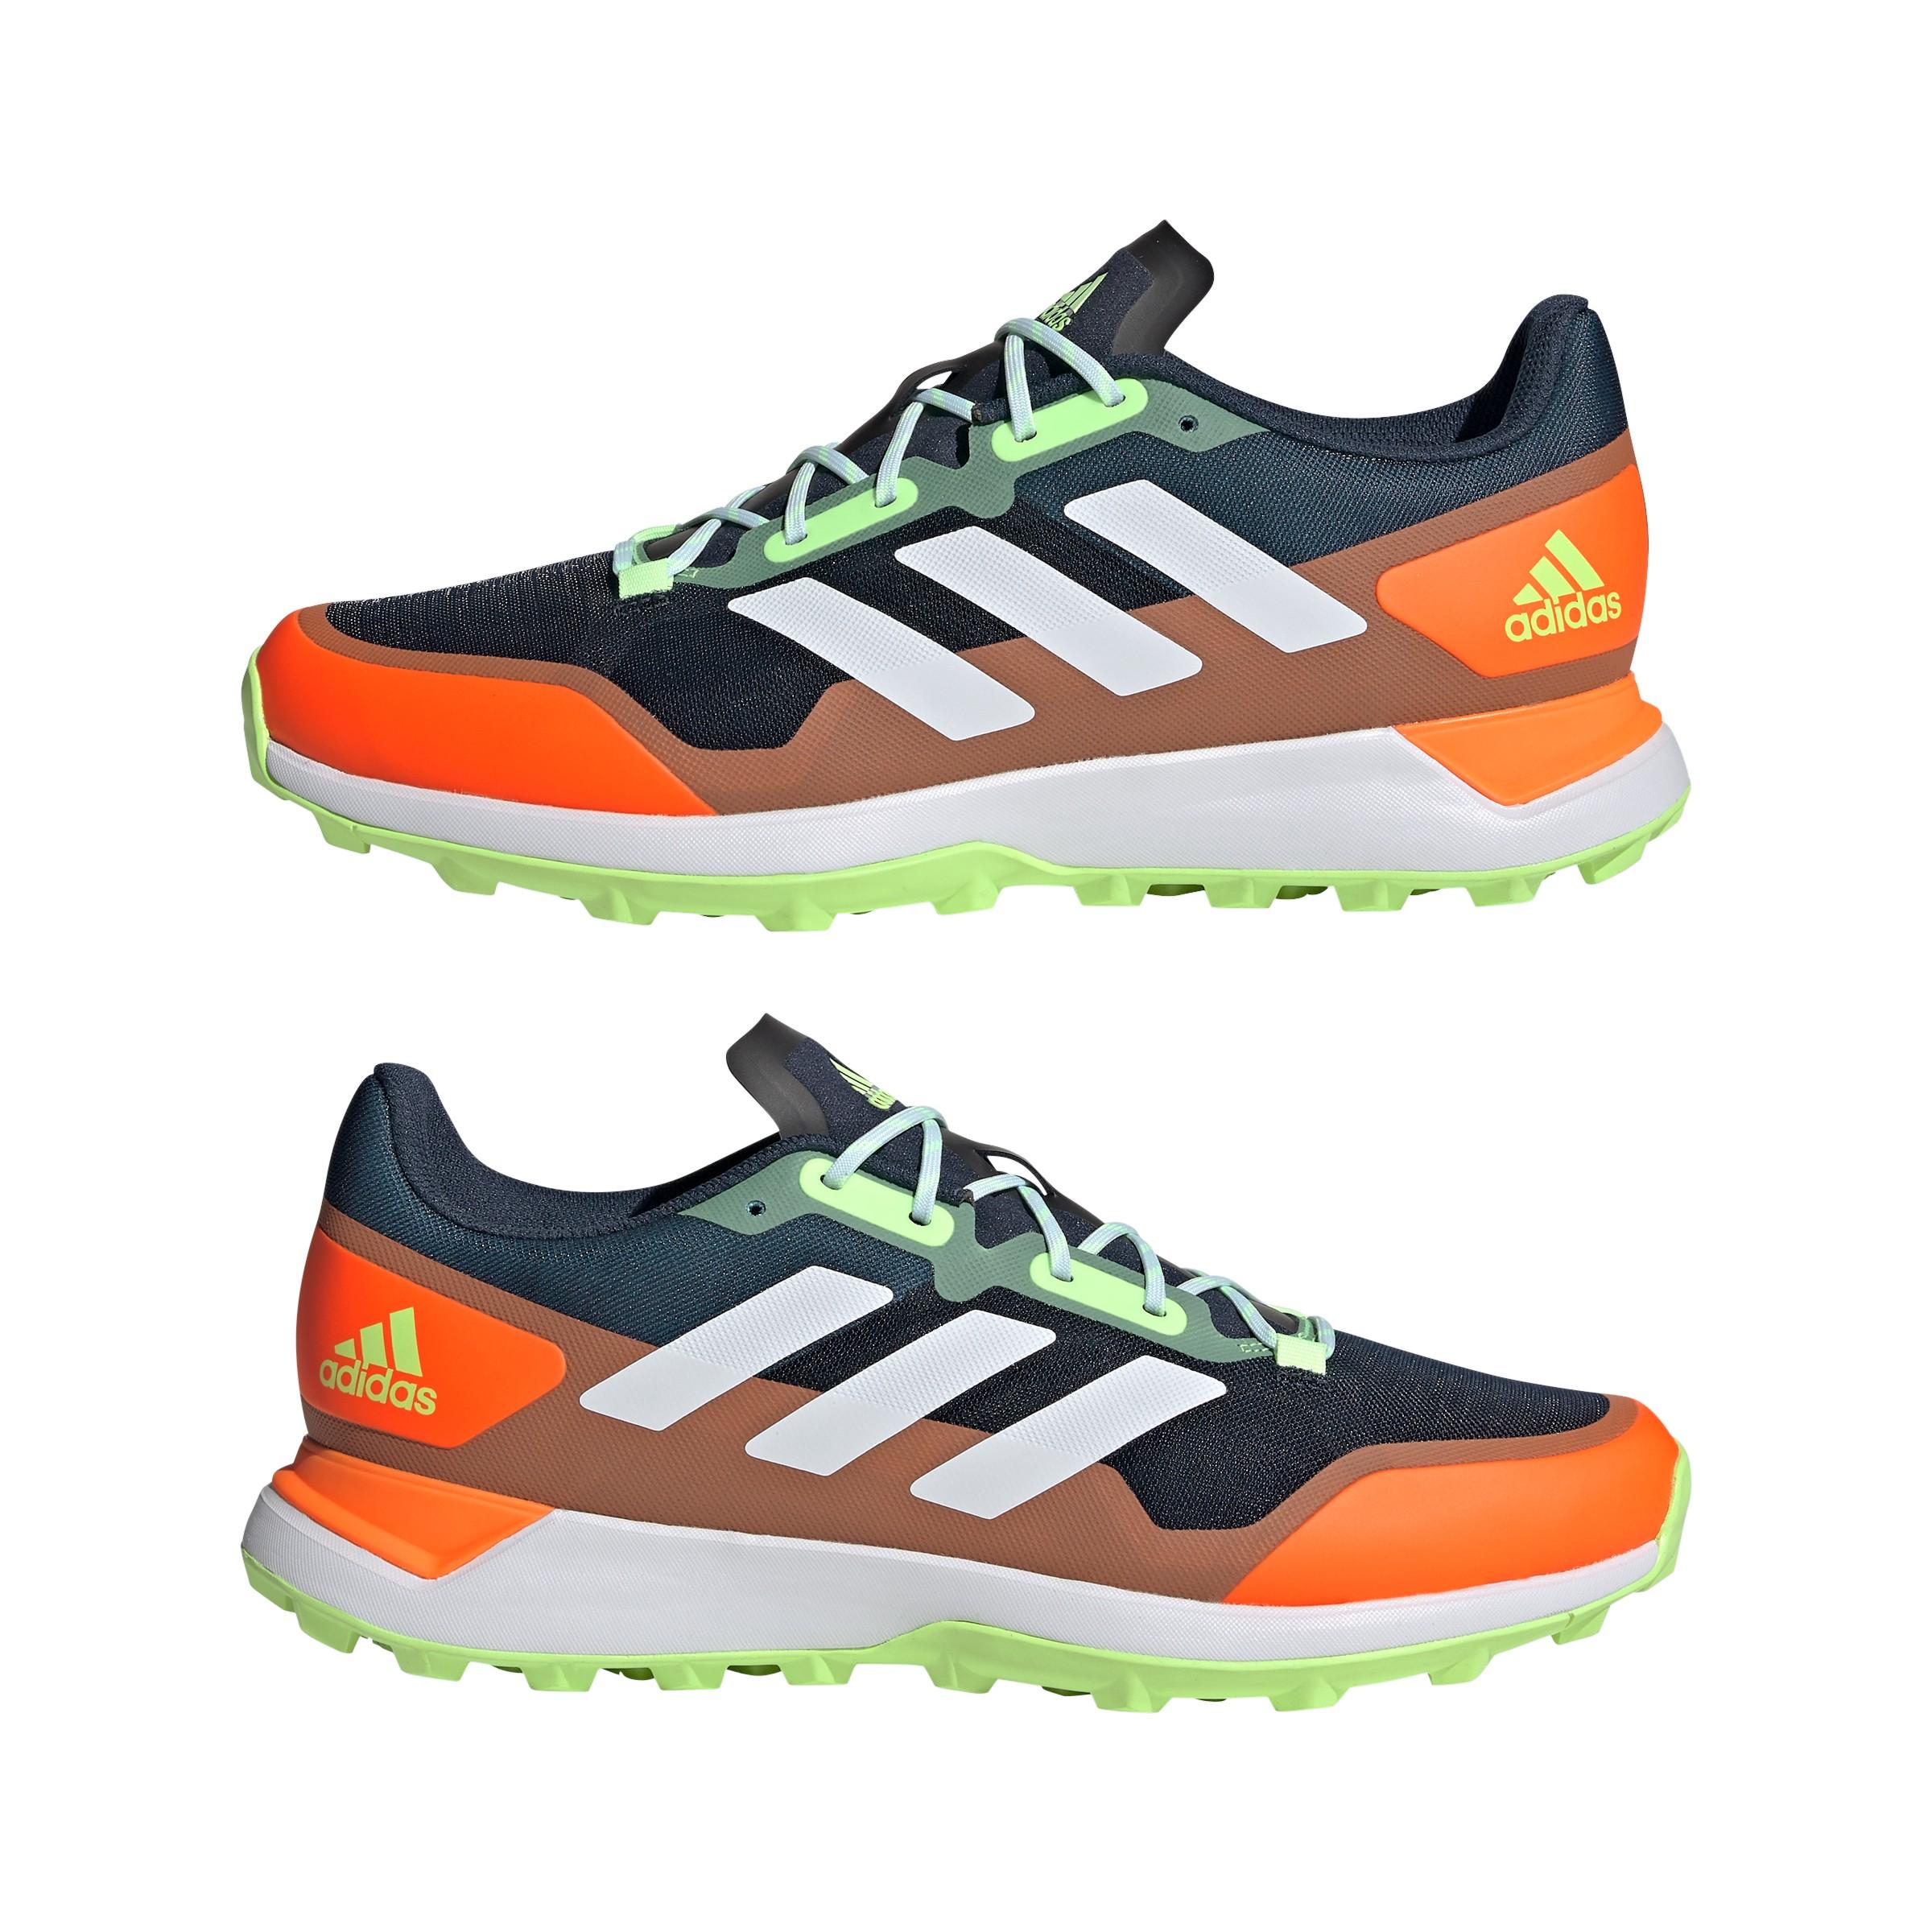 Adidas Zone Dox 2.0 Hockey Shoes - Navy (2020/21) - Buy Now